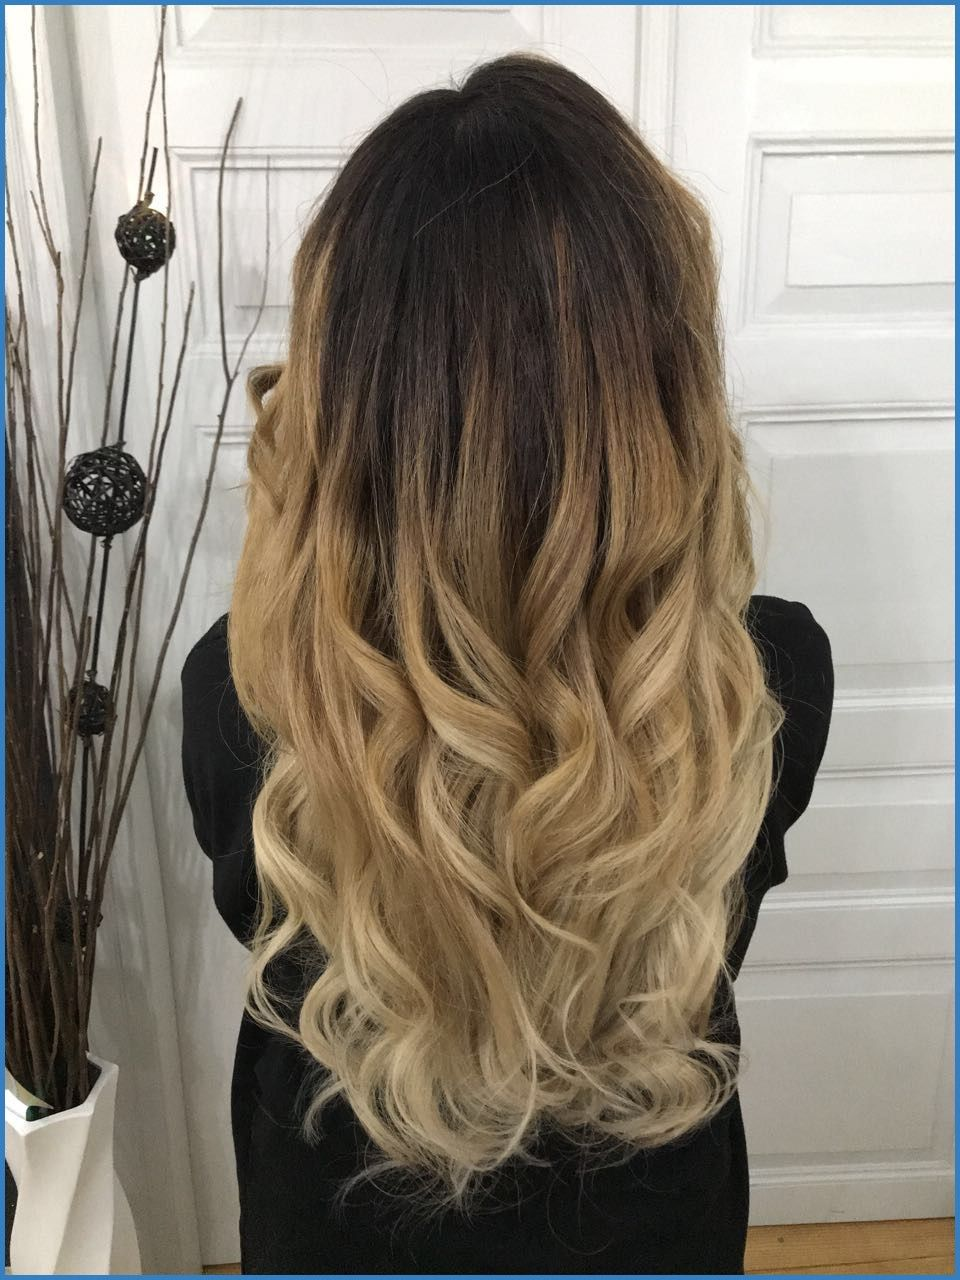 Frisch Frisuren Mit Extensions Bondings Frisuren